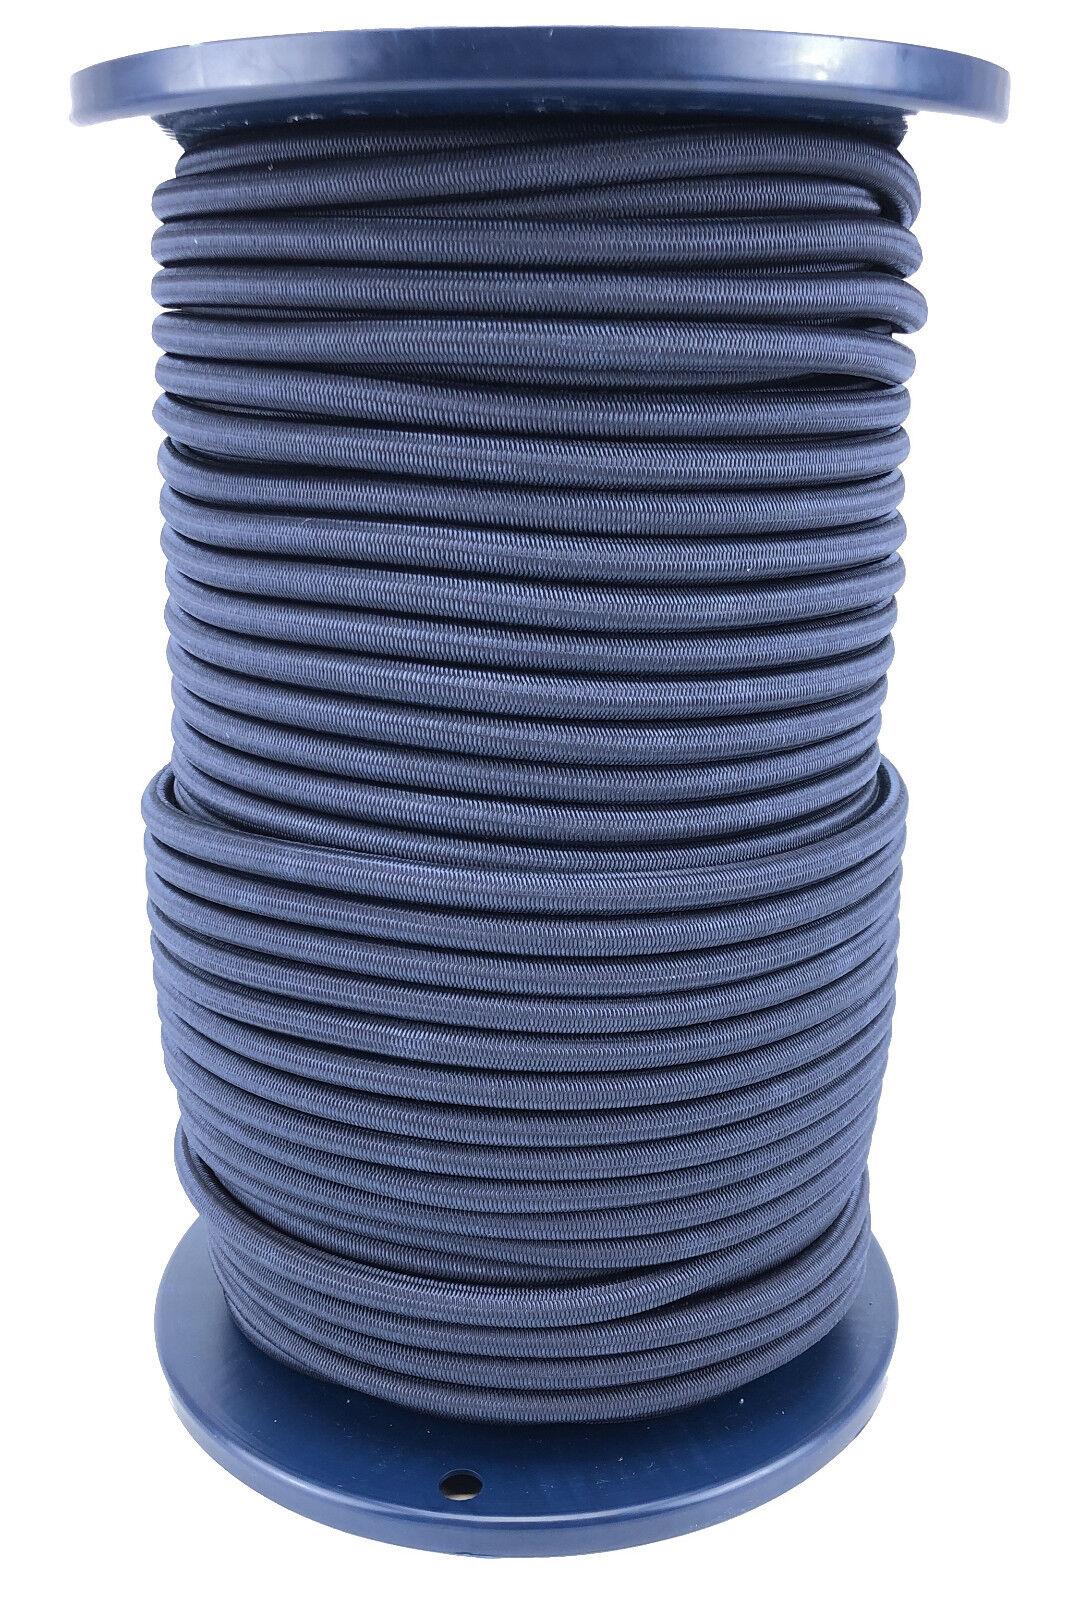 8mm Marineblau Elastischer Gummizug Seil X 100 Meter Meter Meter Krawatte Unten 796aed